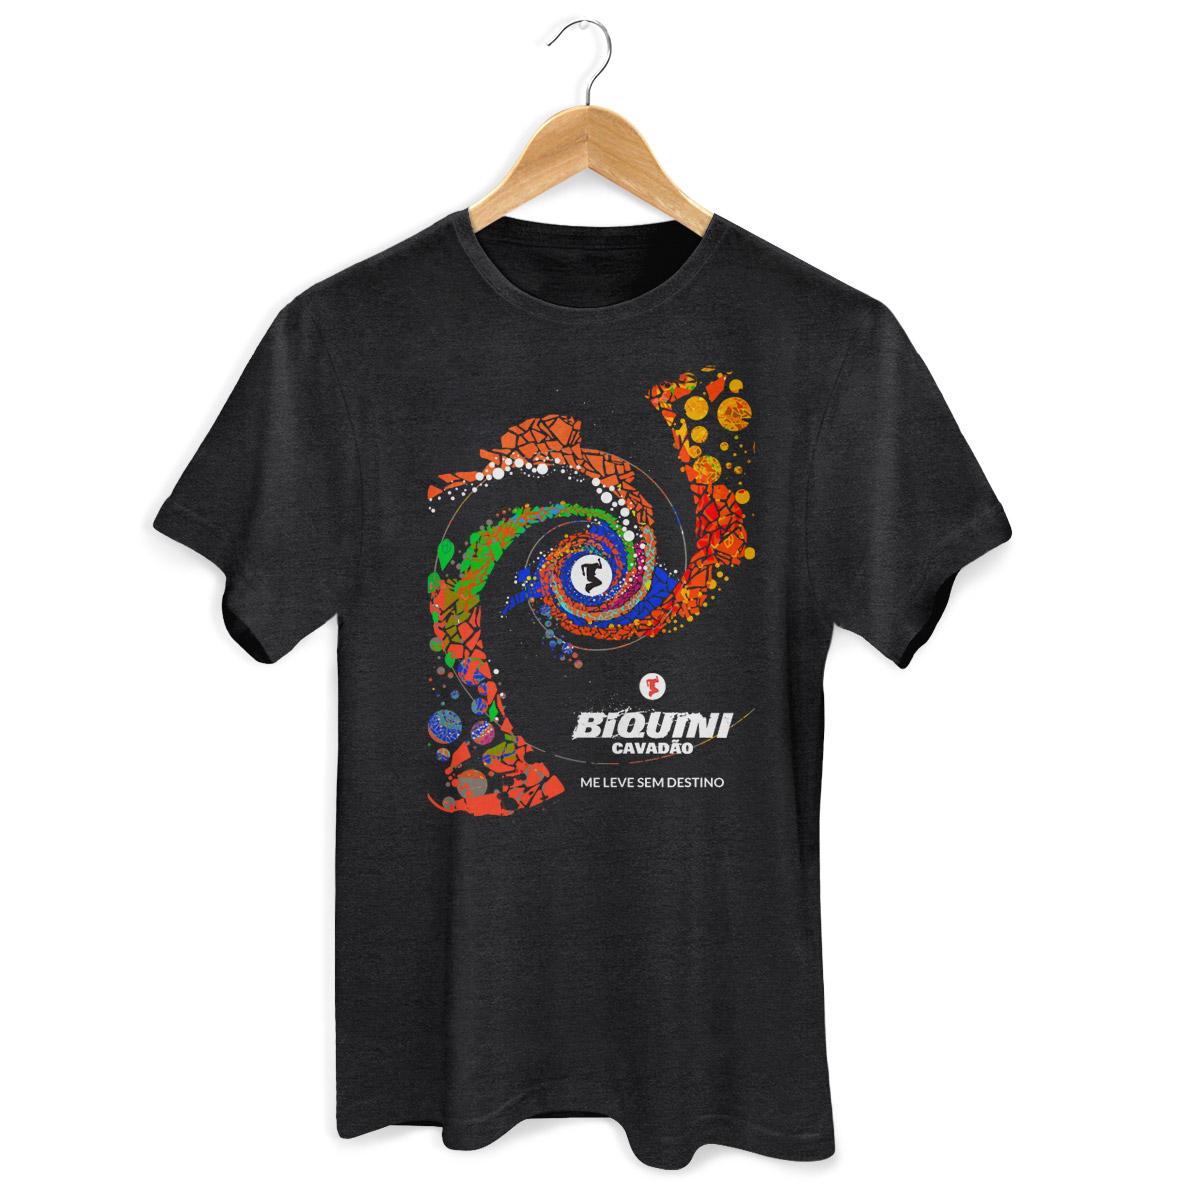 T-shirt Premium Masculina Biquini Cavadão Me Leve Sem Destino